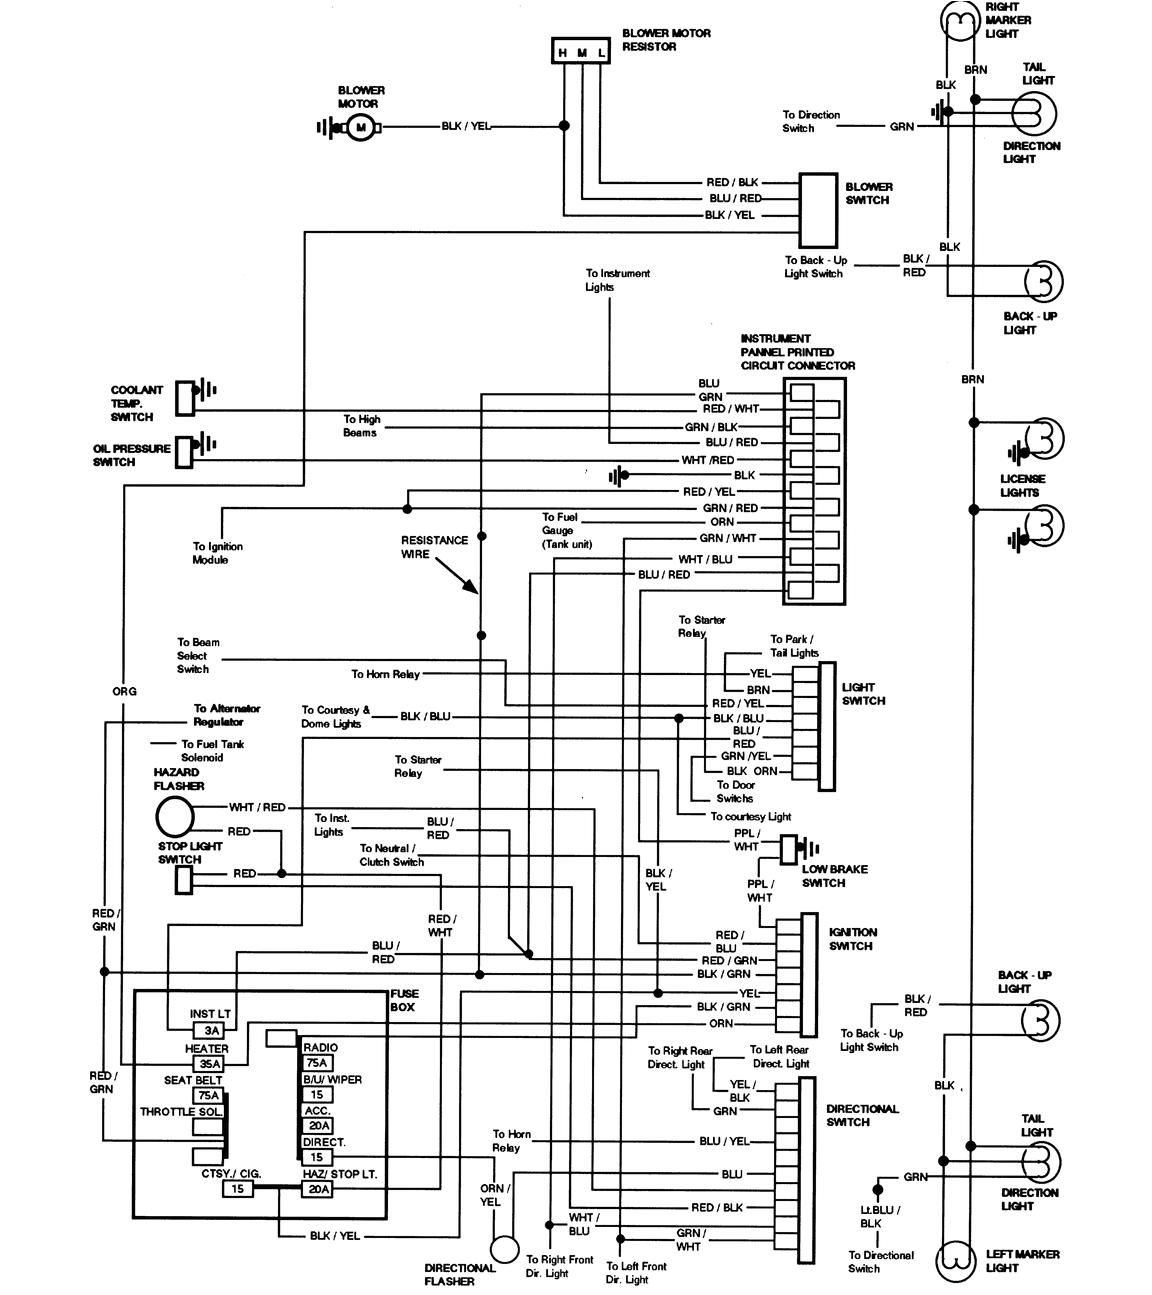 1978 ford f 250 wiring diagram premium wiring diagram blog 1978 ford f 250 wiring diagram